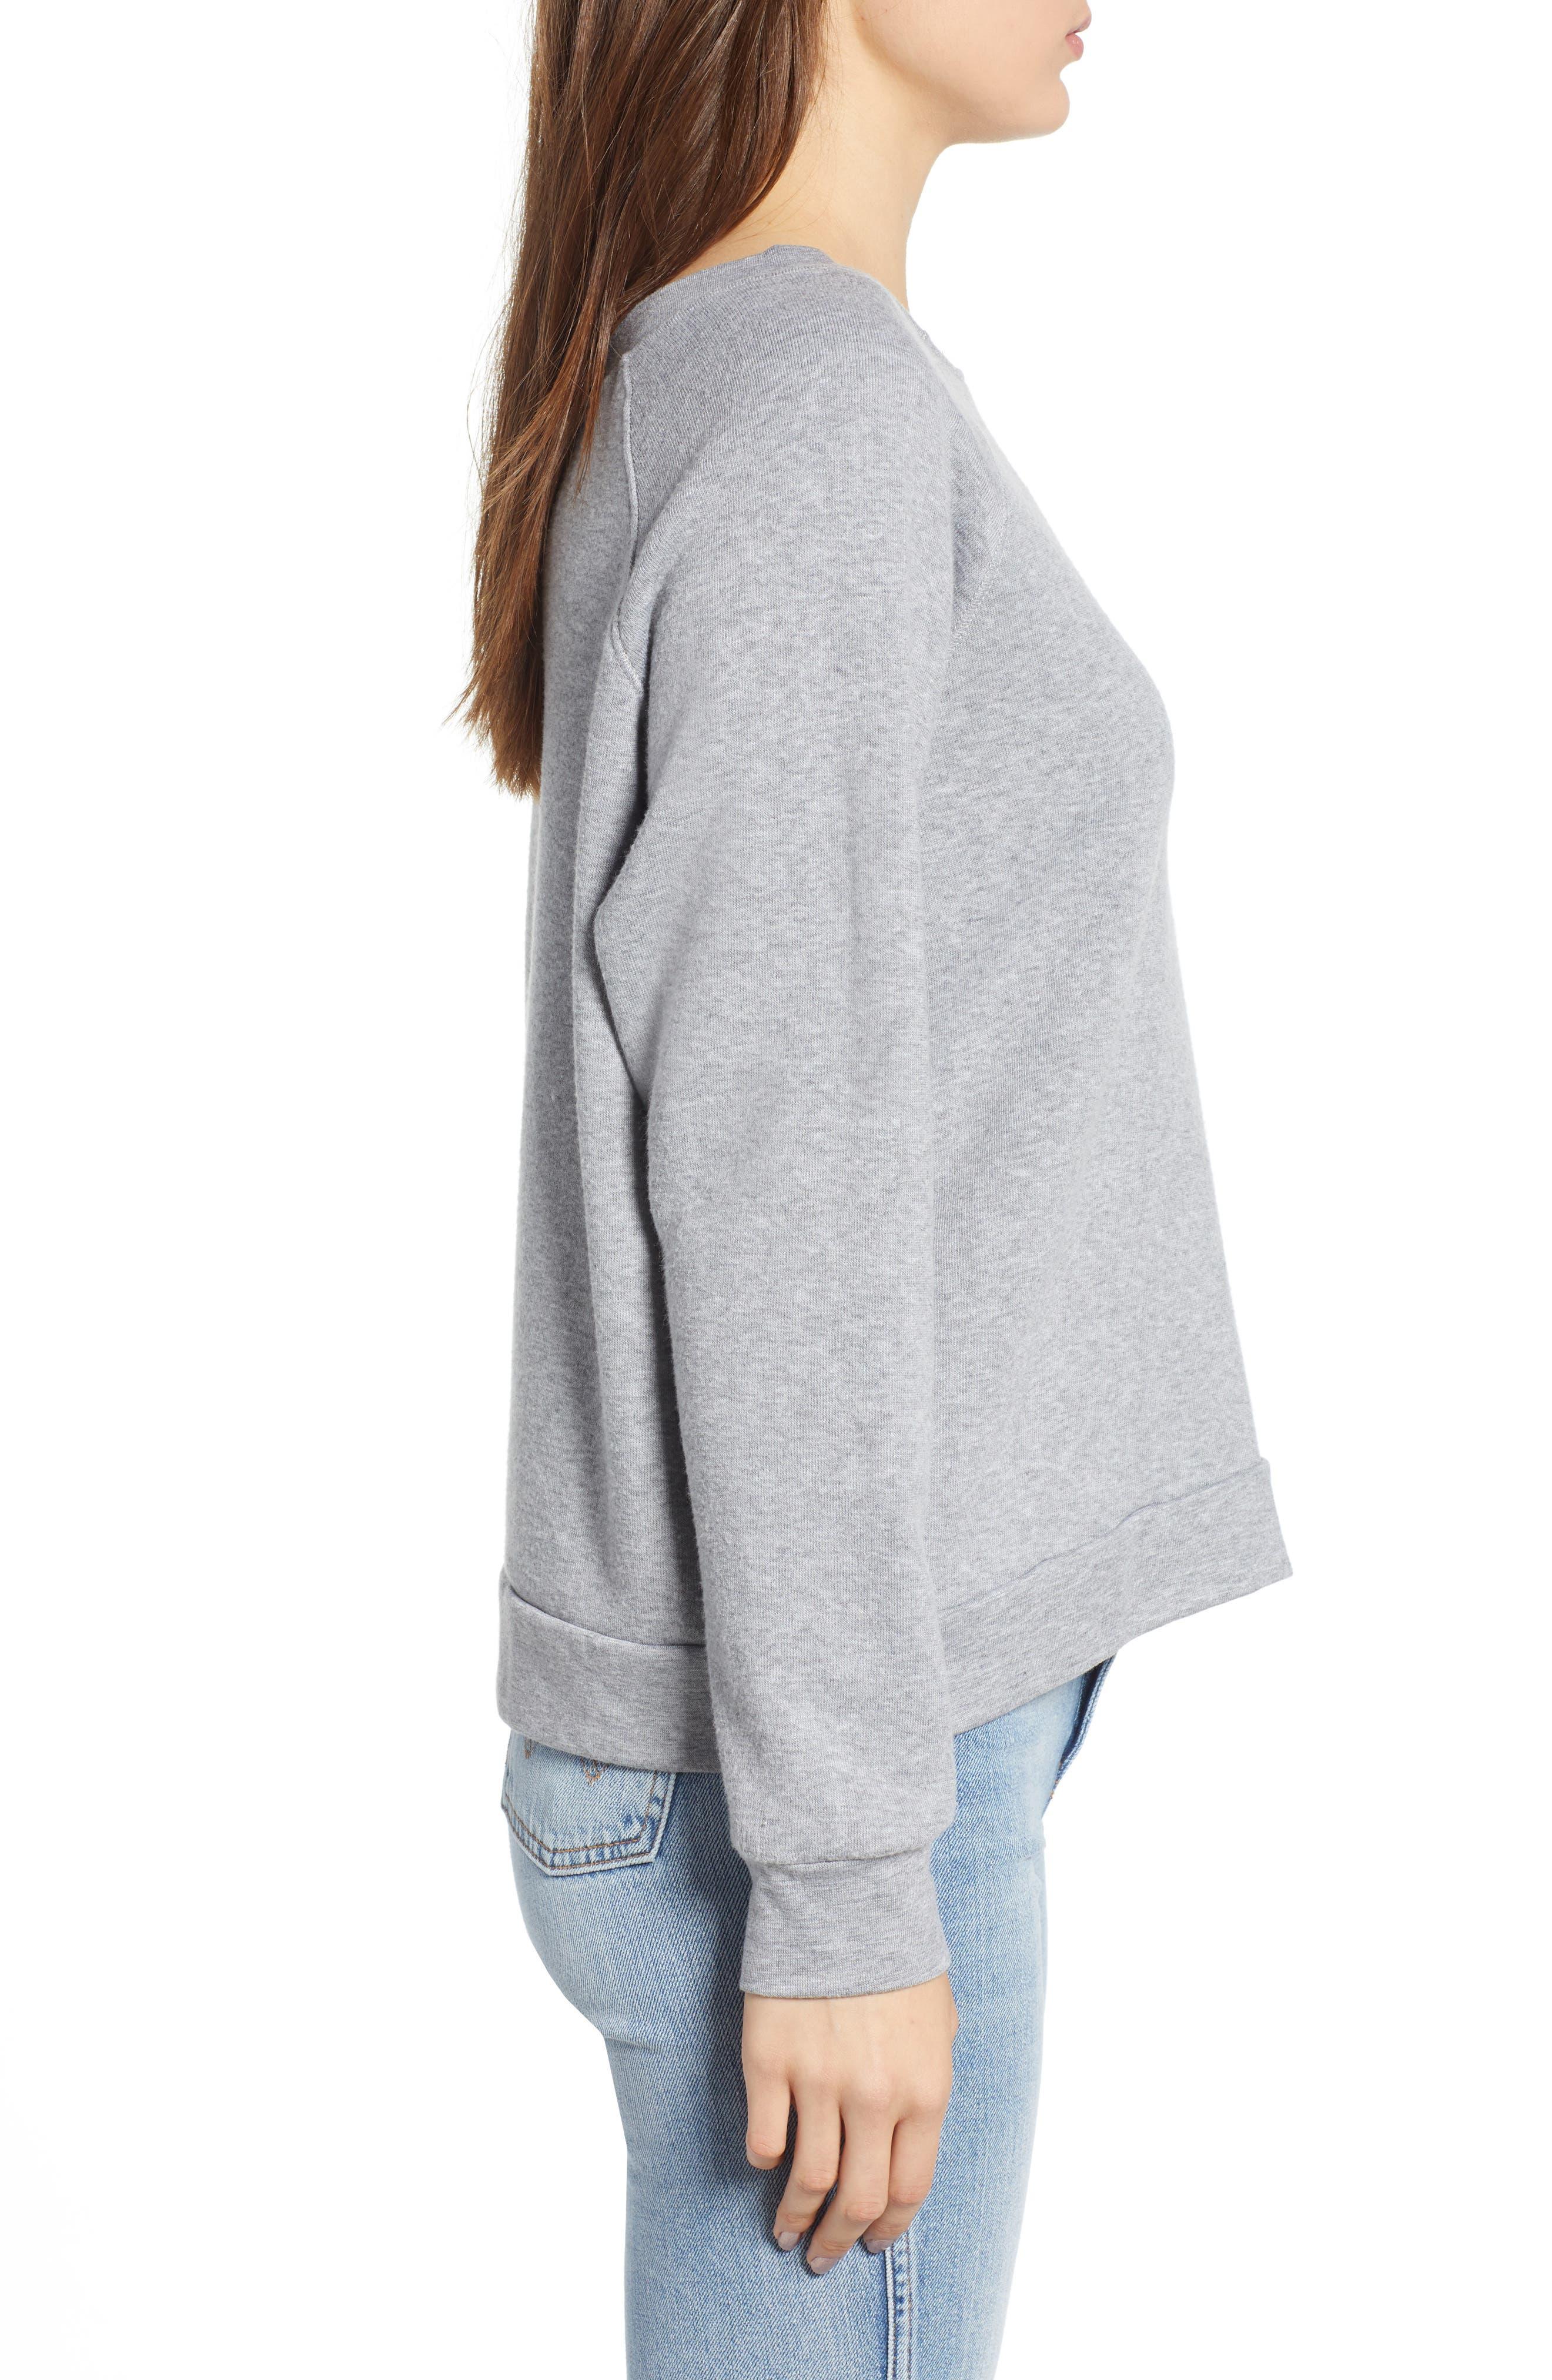 Reversible Graphic Sweatshirt,                             Alternate thumbnail 4, color,                             HEATHER GREY